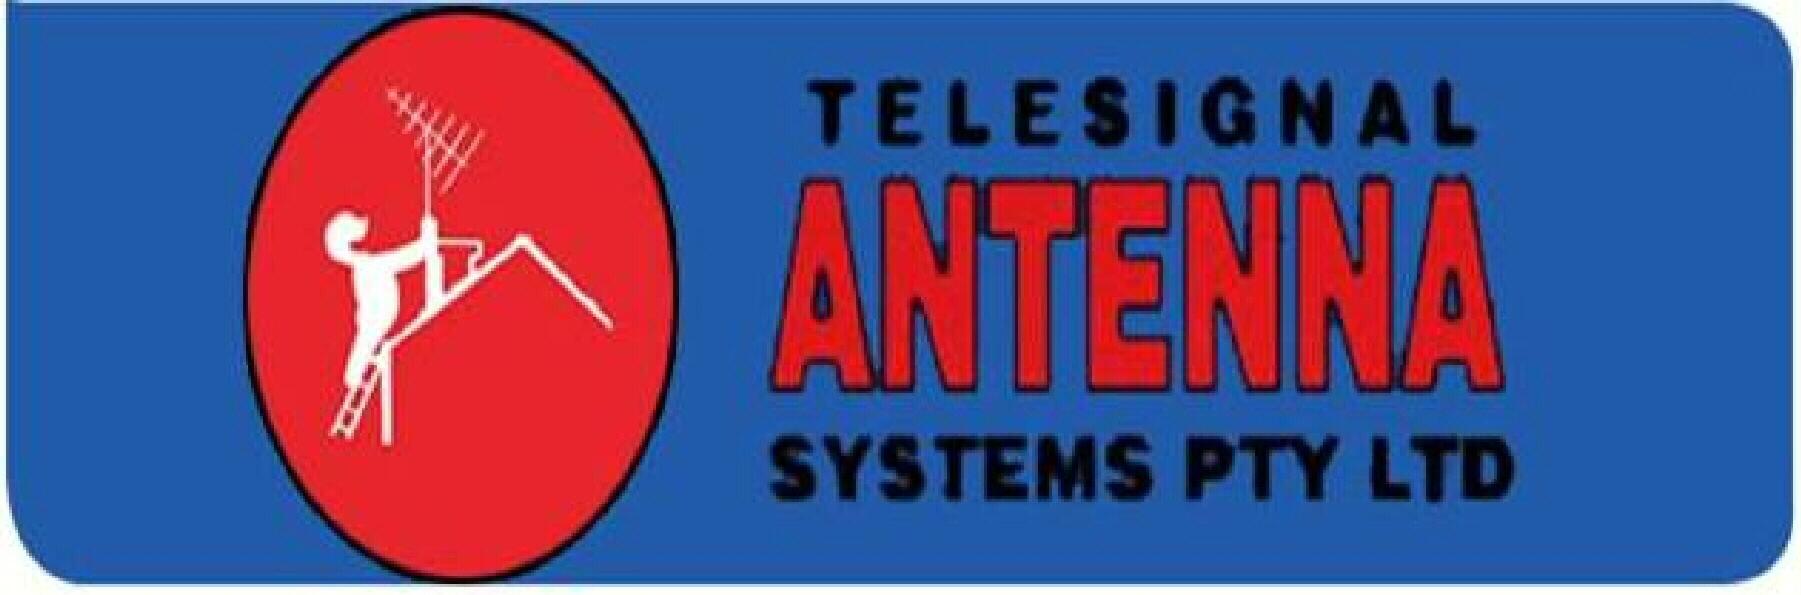 Telesignal Antenna Systems